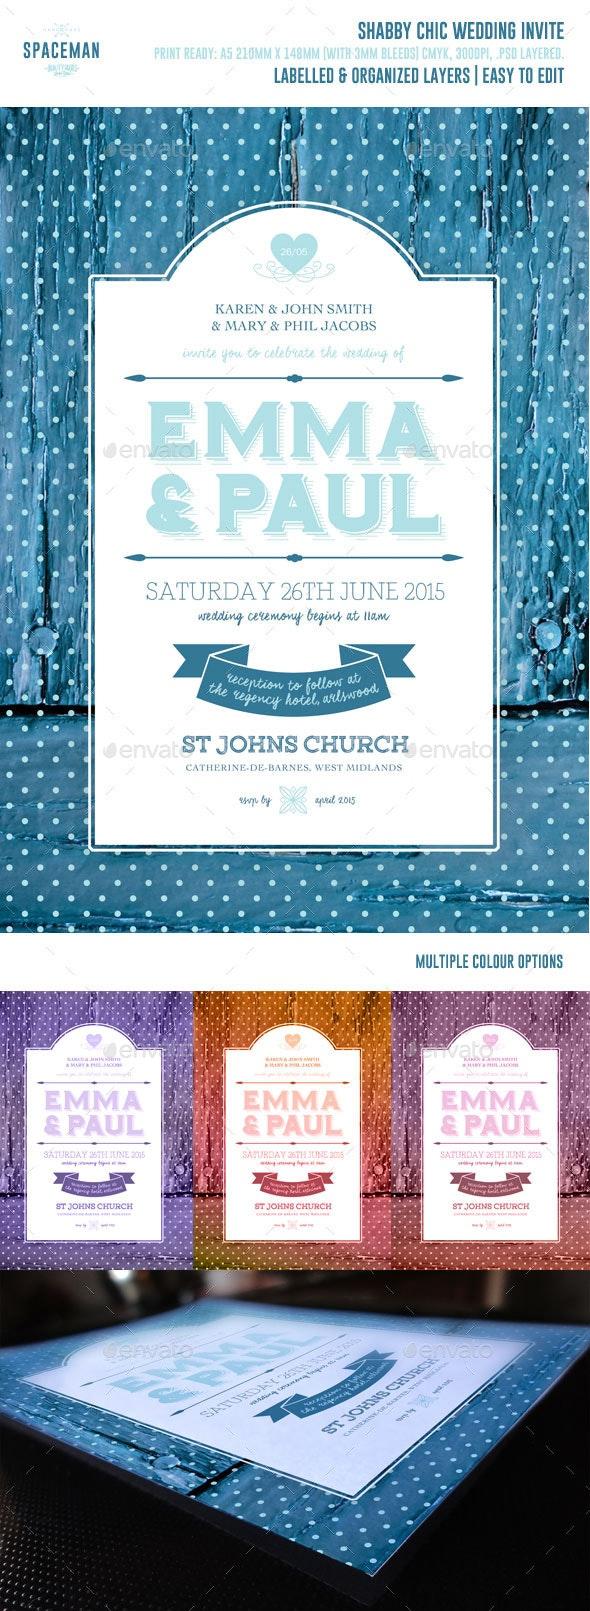 Shabby Chic Wedding Invite - Weddings Cards & Invites